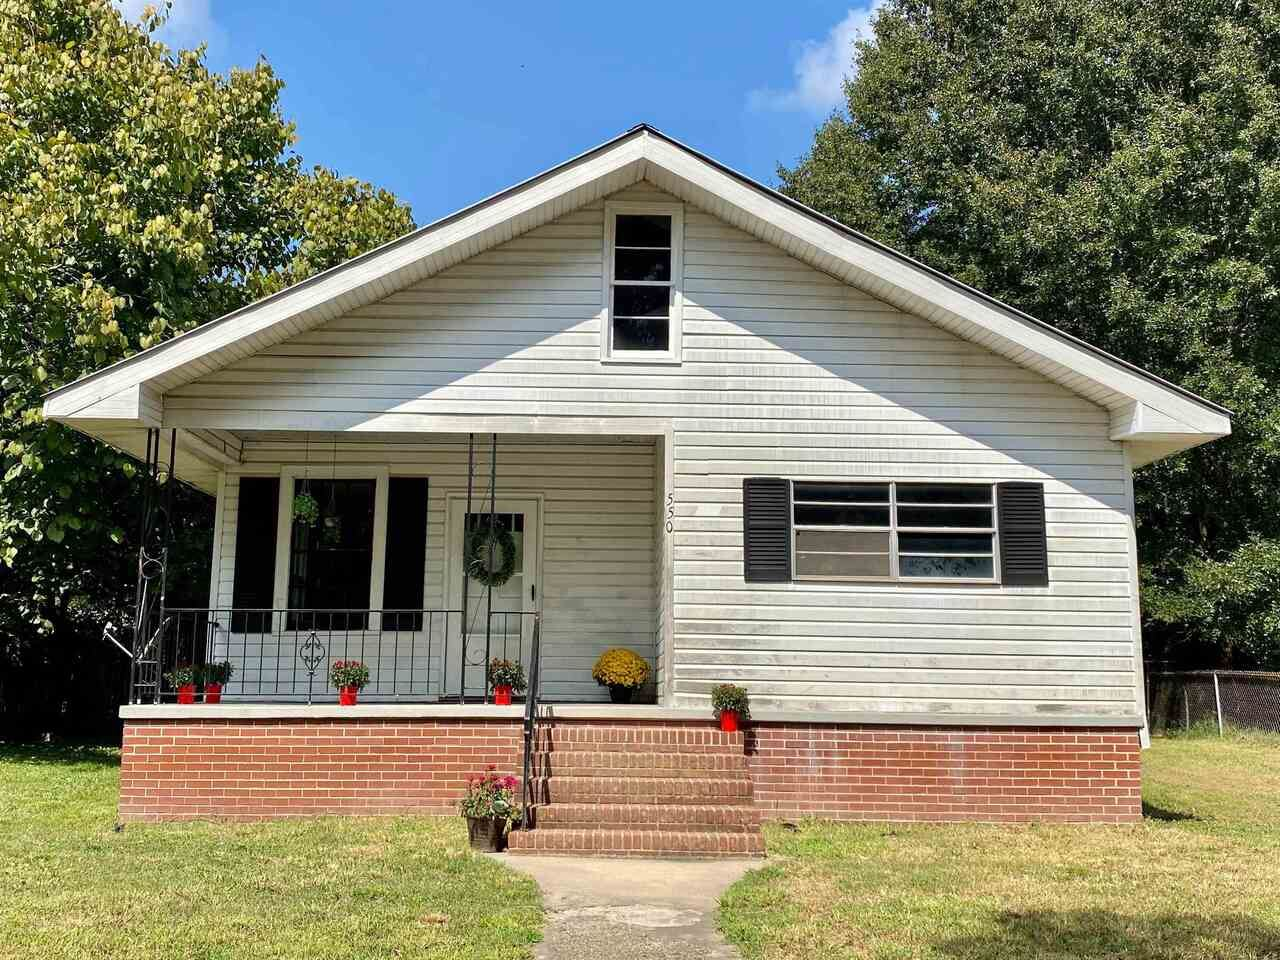 550 Second Street NE, Cedartown, GA 30165 - MLS#: 9051631